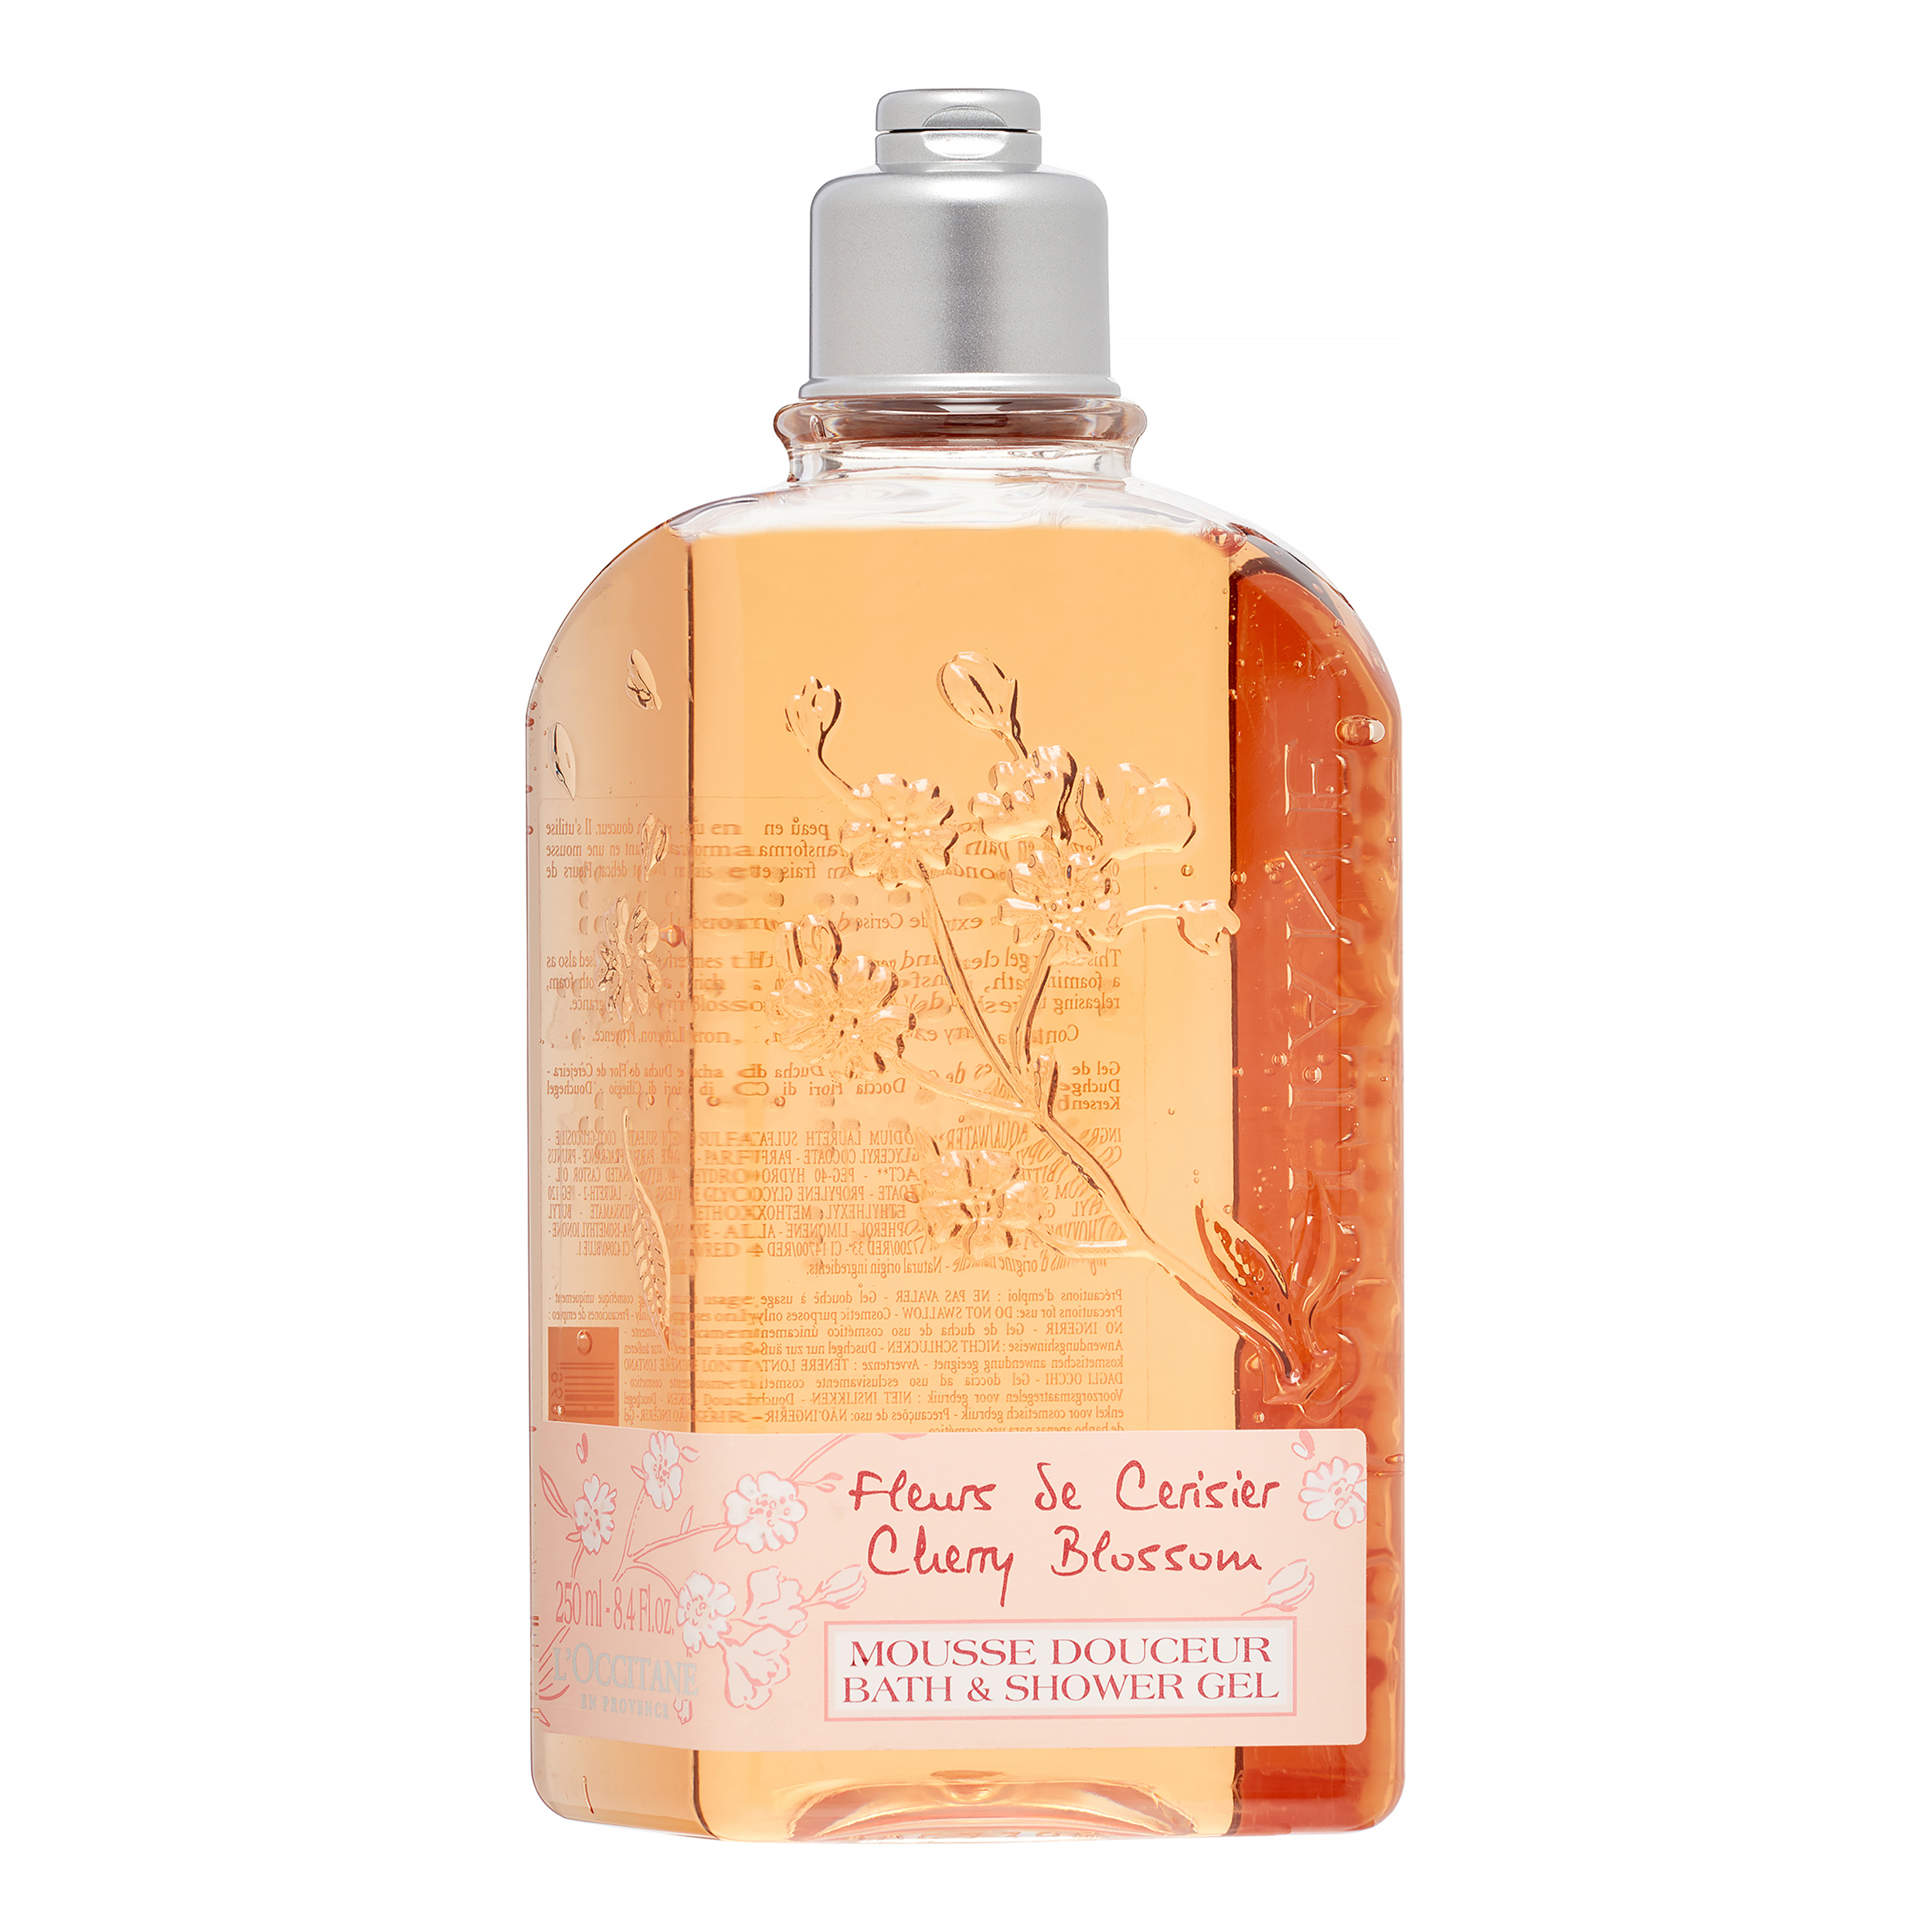 L'Occitane Cherry Blossom Body Wash Shower Gel, 8.4 Oz